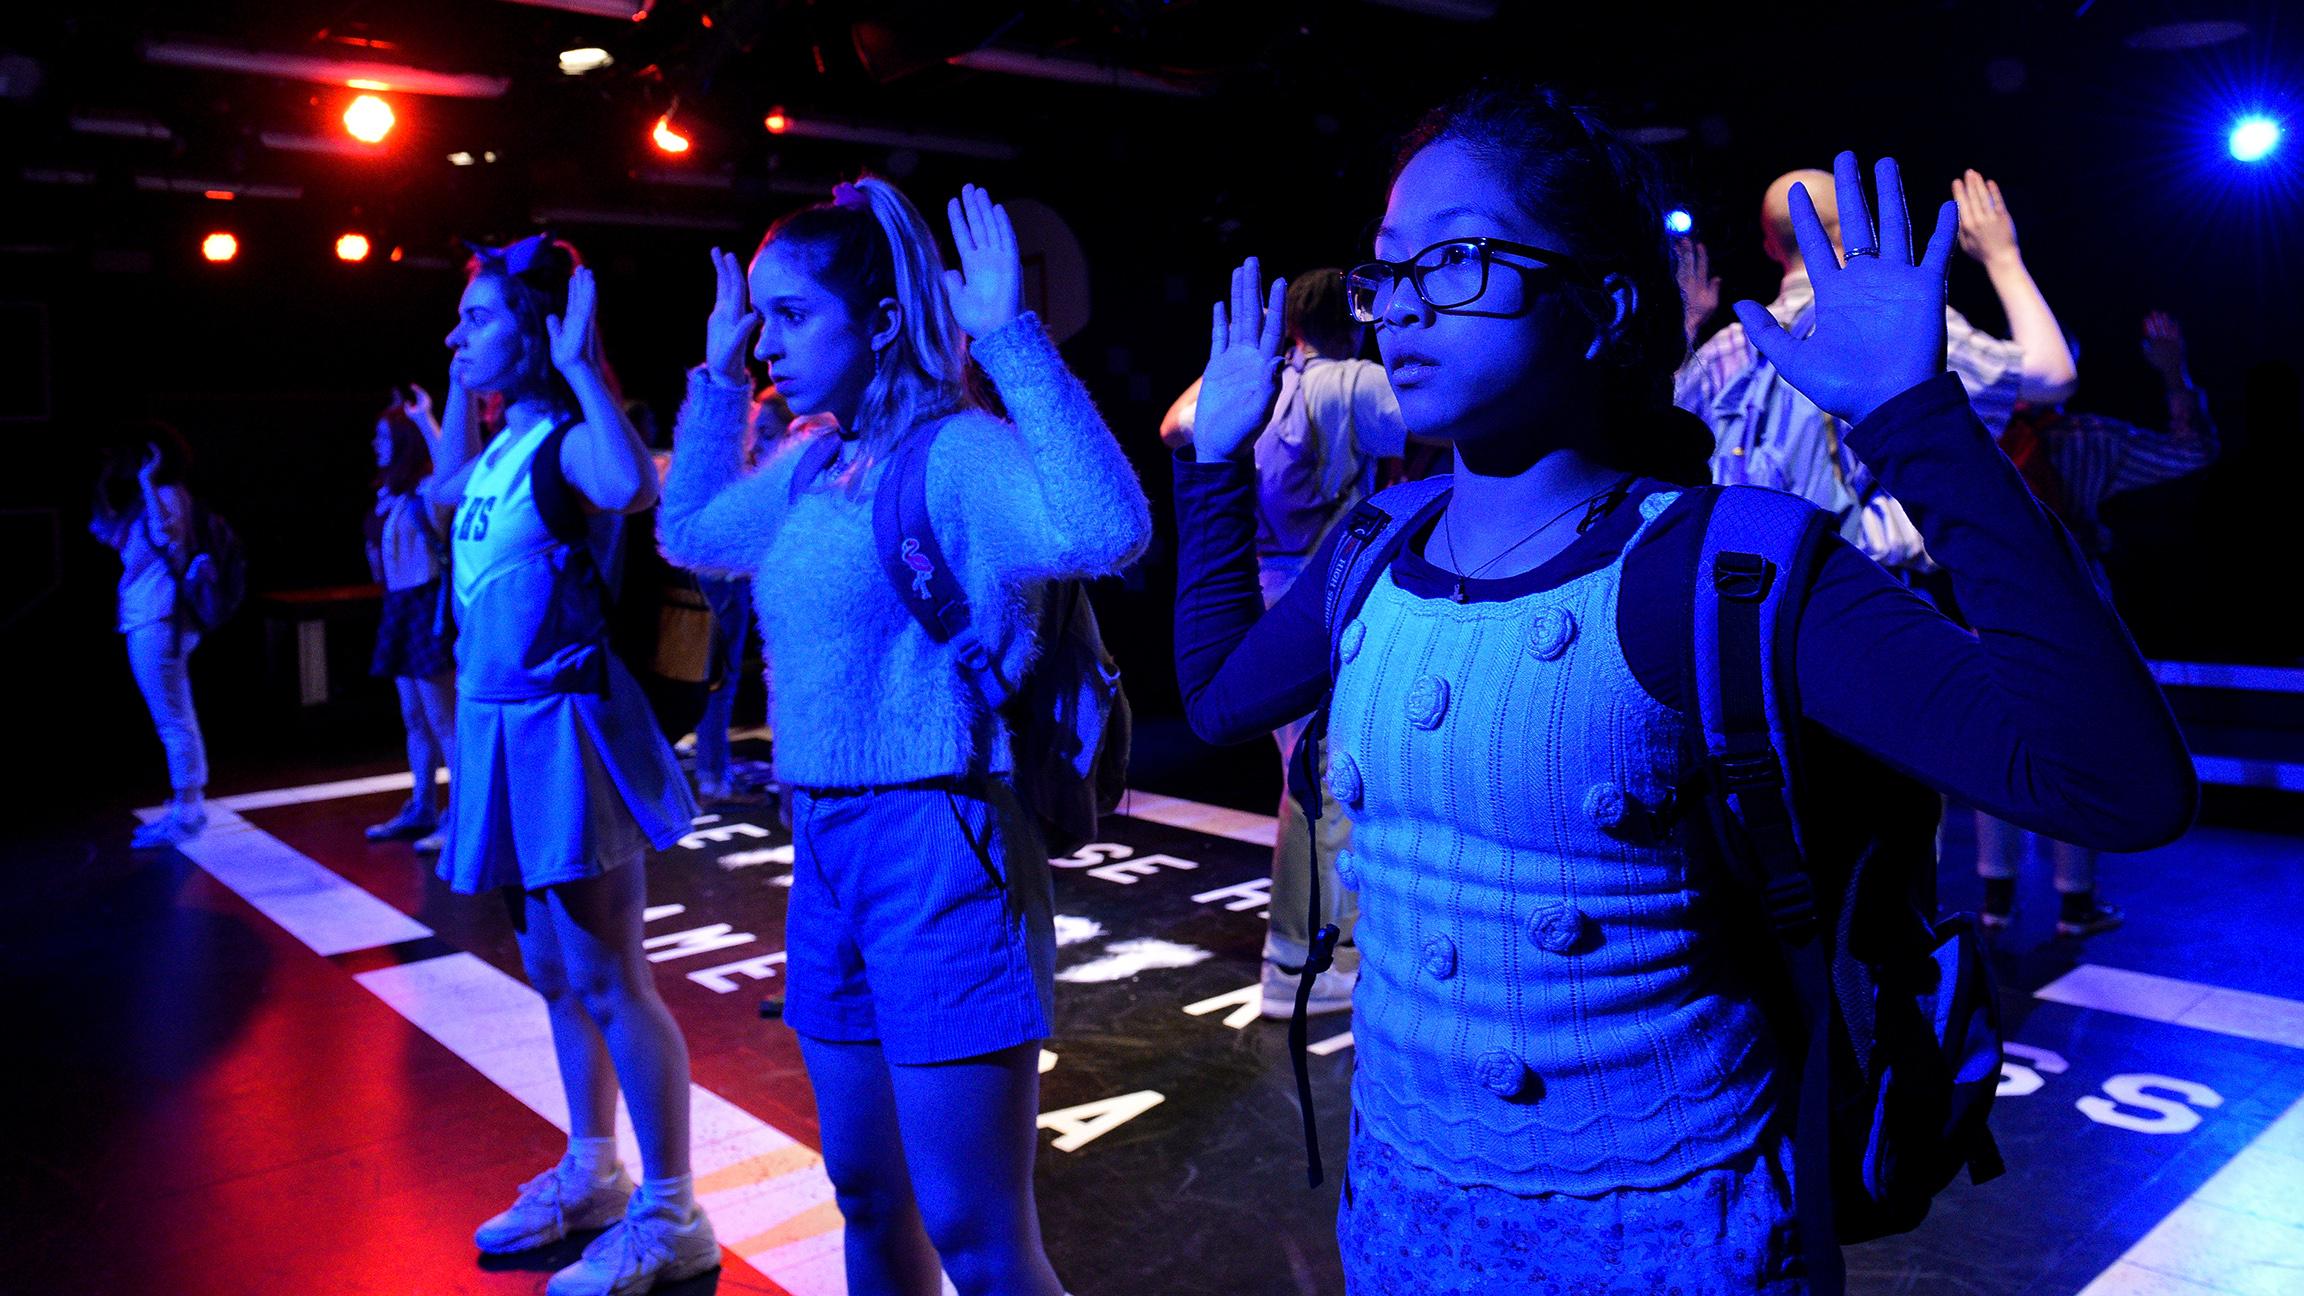 Columbinus' More Harrowing With Cast of Actual High School